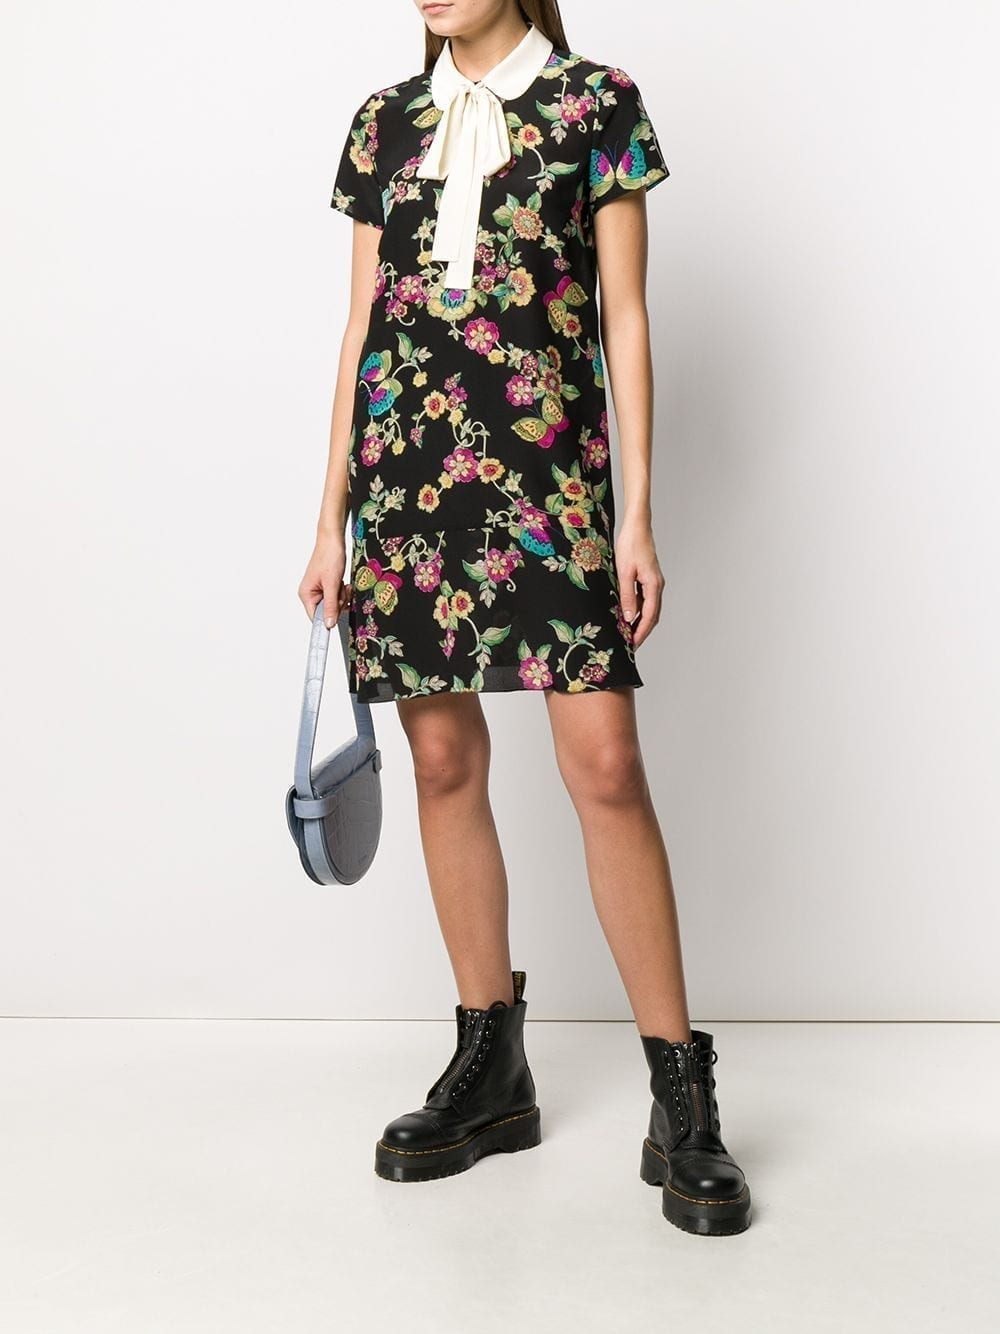 REDVALENTINO Floral Butterfly-print Dress